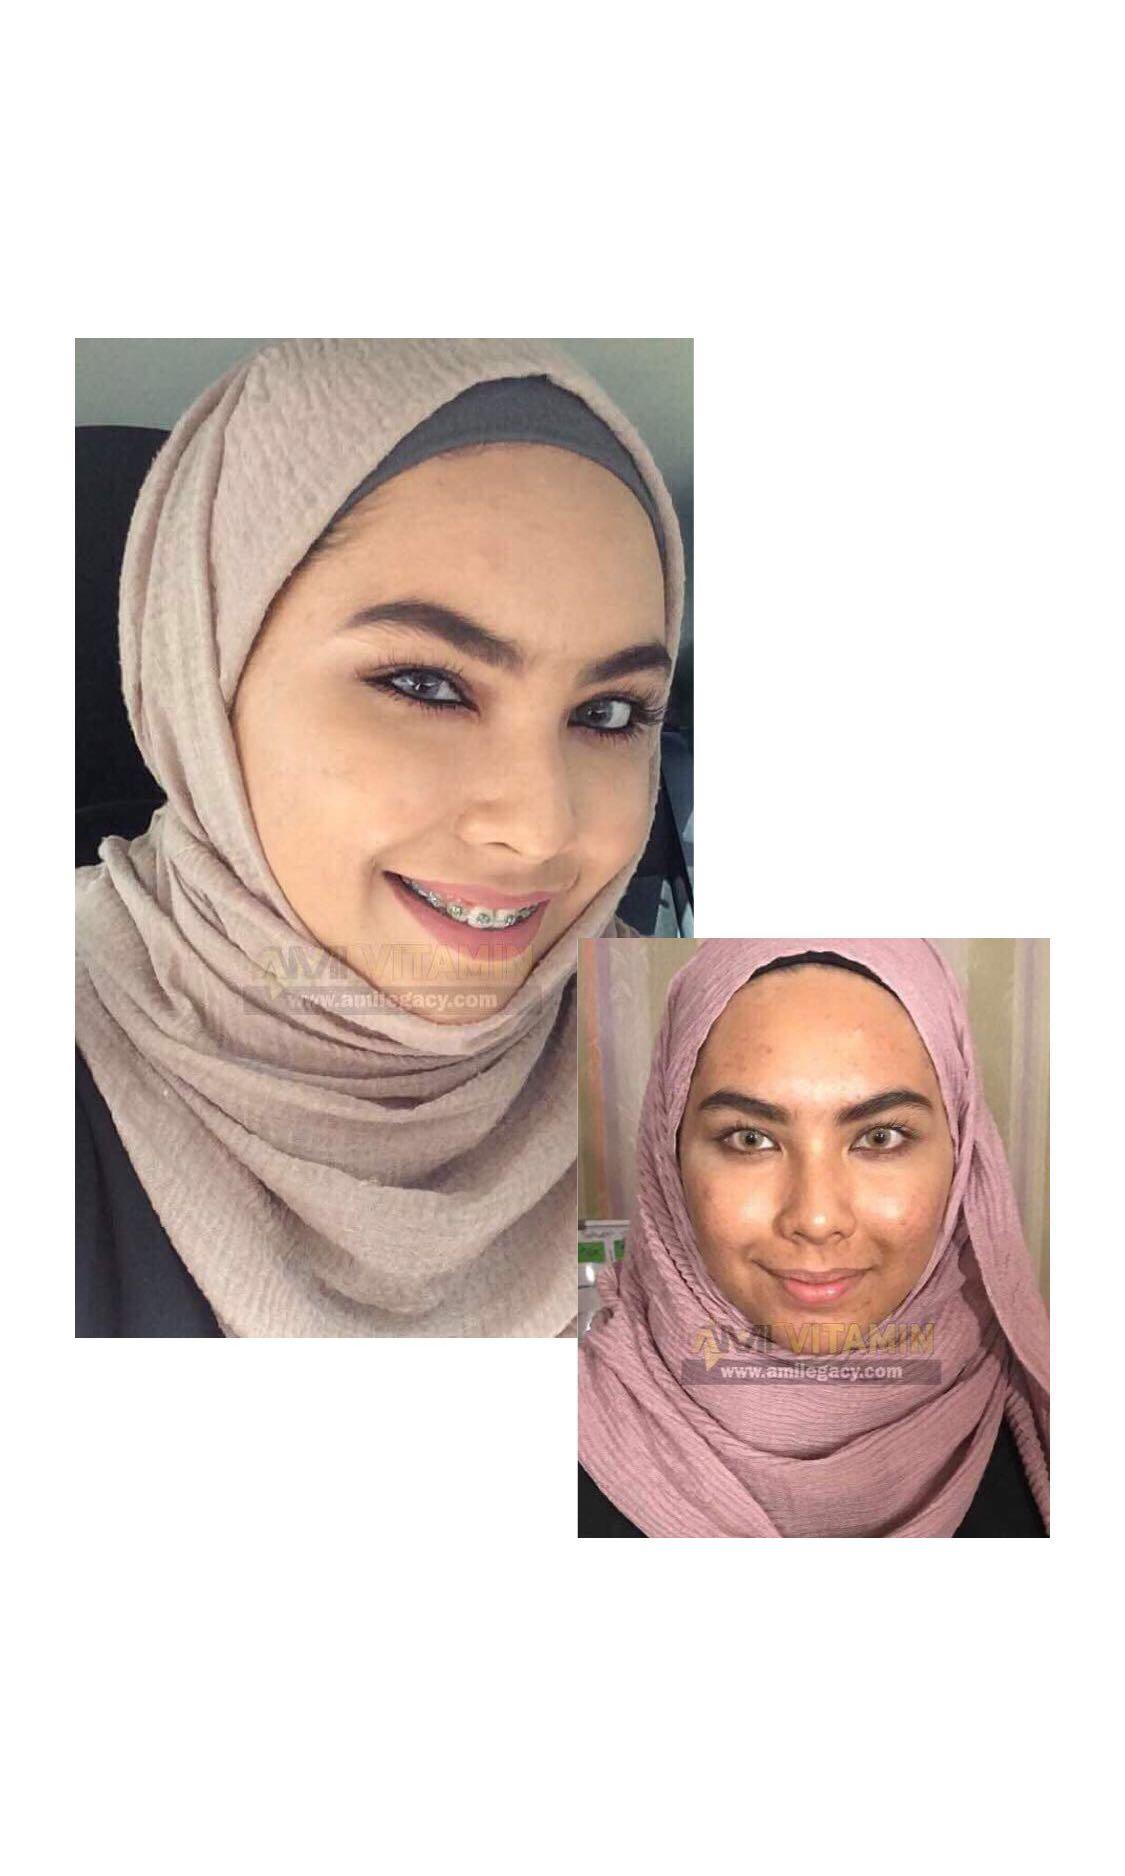 Pure Vitamin C Ami Legacy Health Beauty Skin Bath Body On Carousell